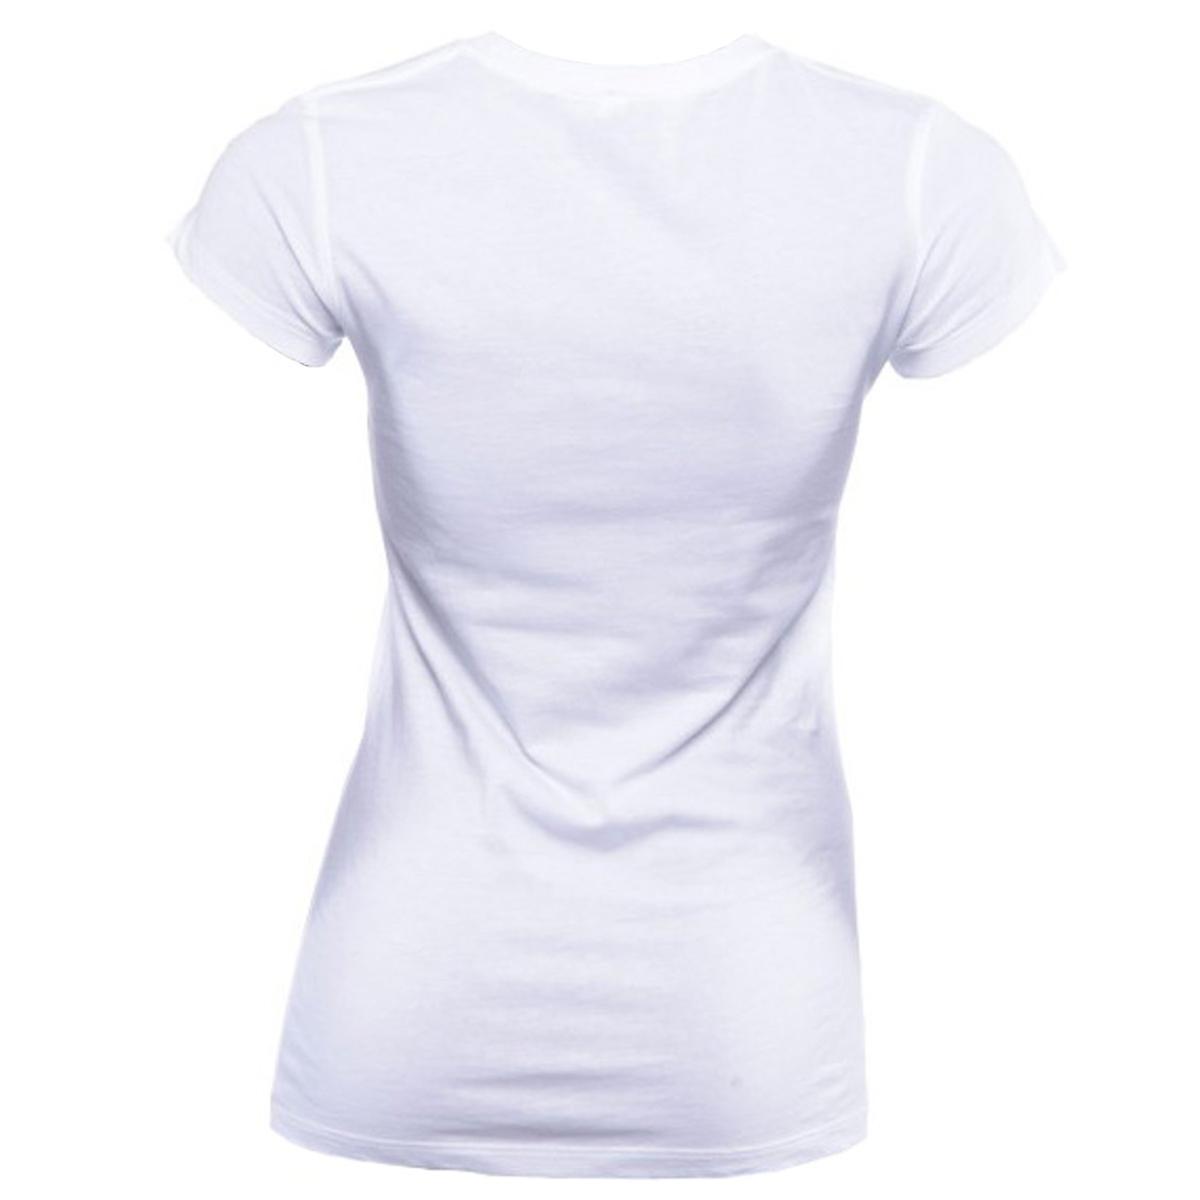 Jaco Women's HT Crew Neck T-Shirt - White/Cobalt